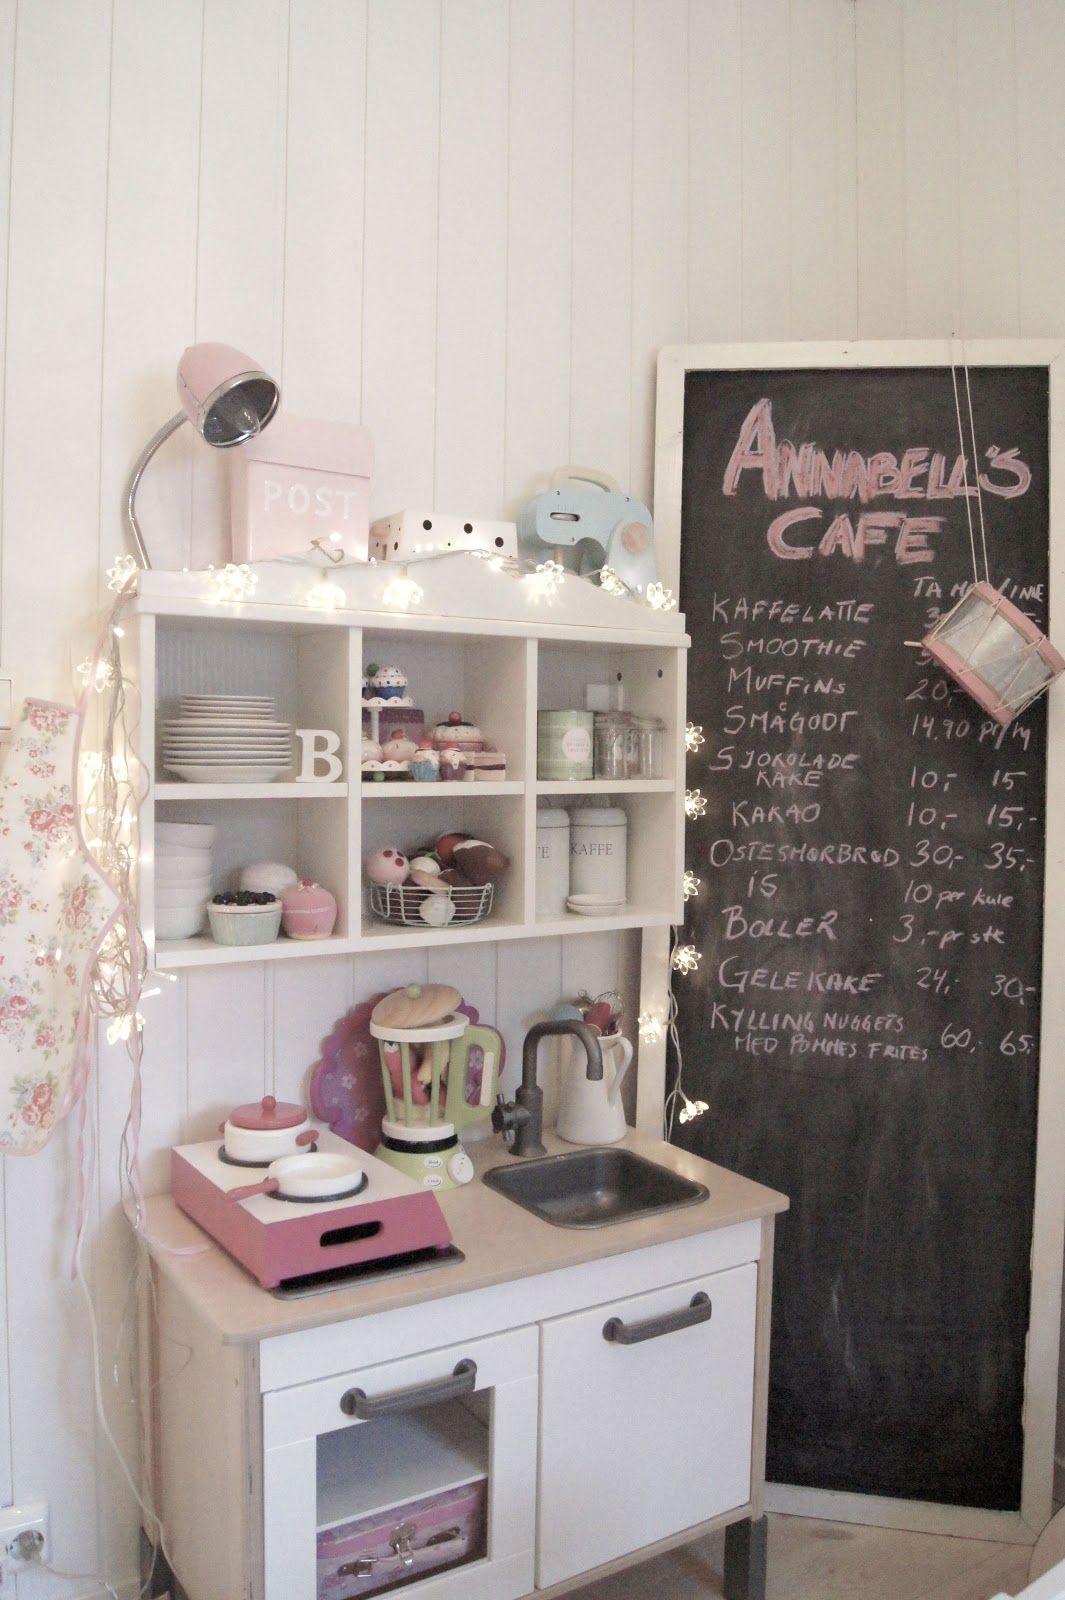 Annabell\'s cafe (featuring an IKEA DUKTIG mini kitchen!) LOOK It ...